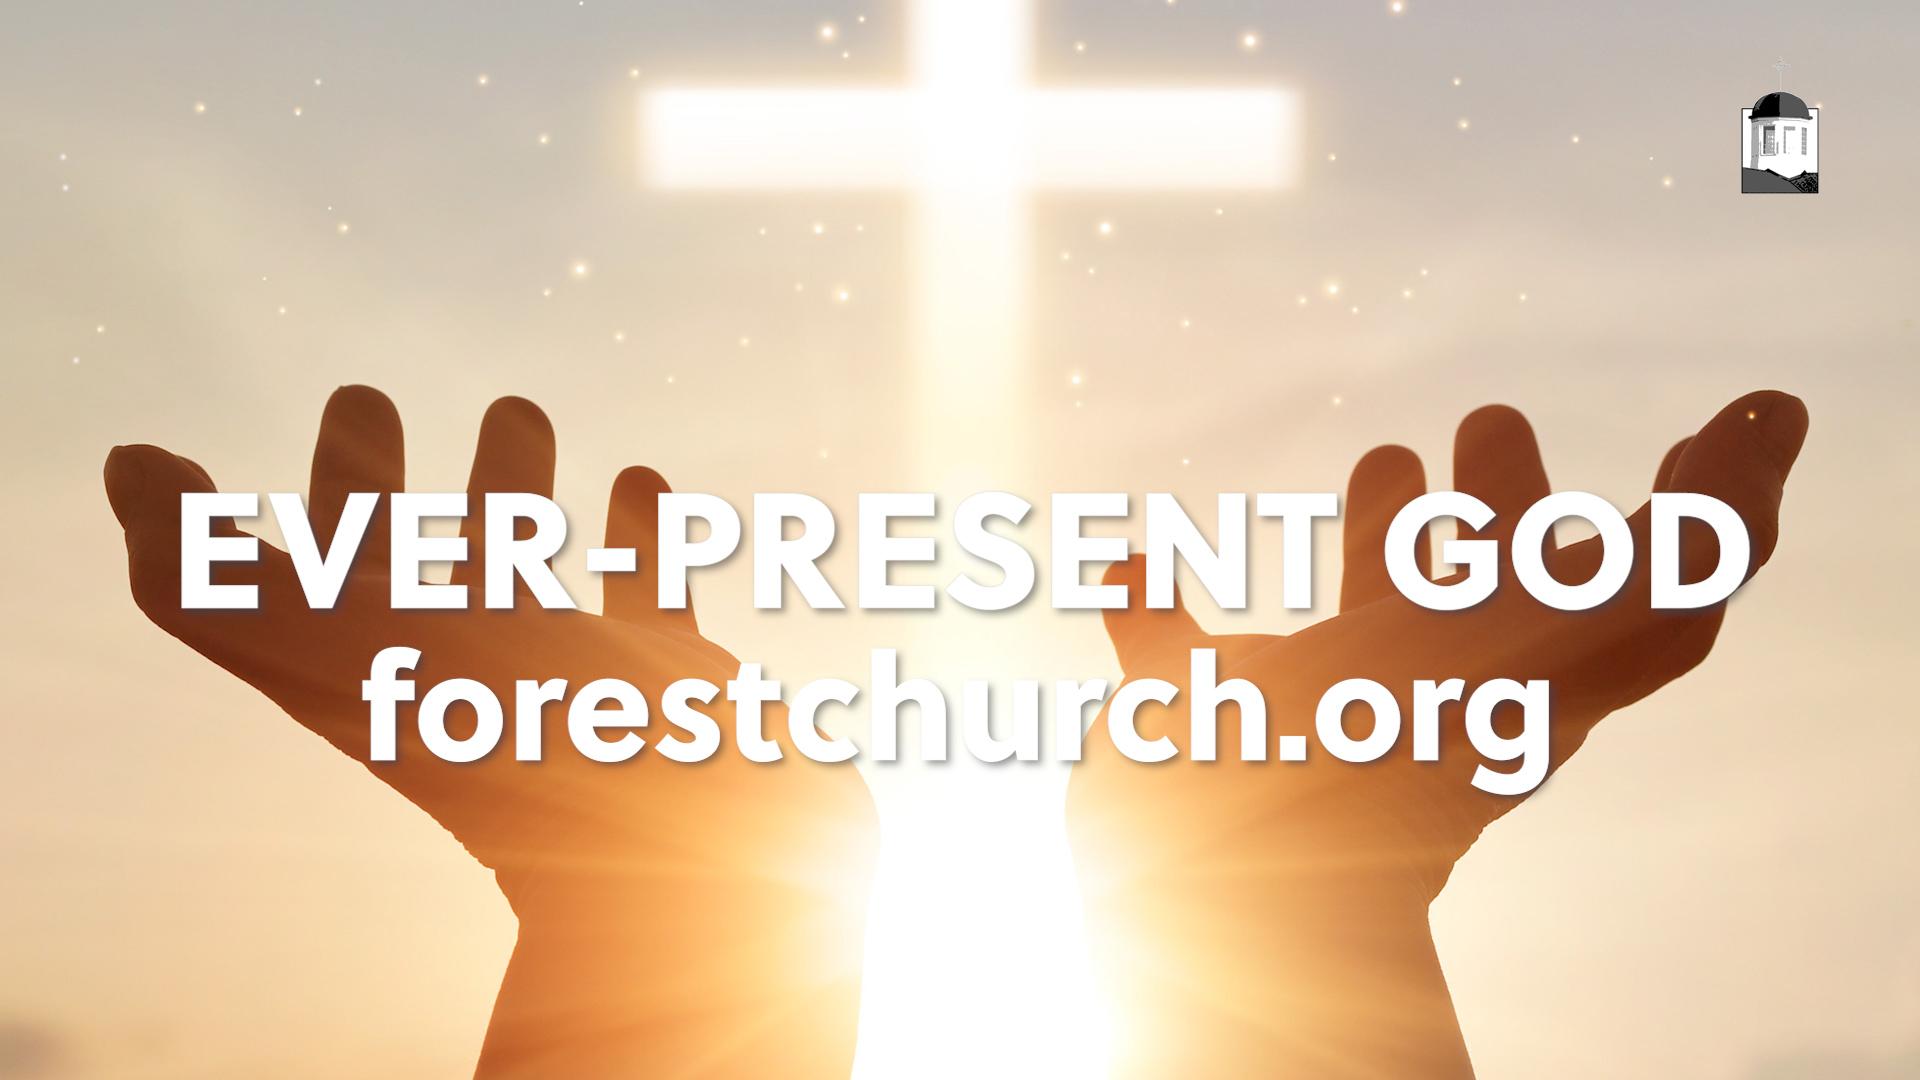 Ever-Present God